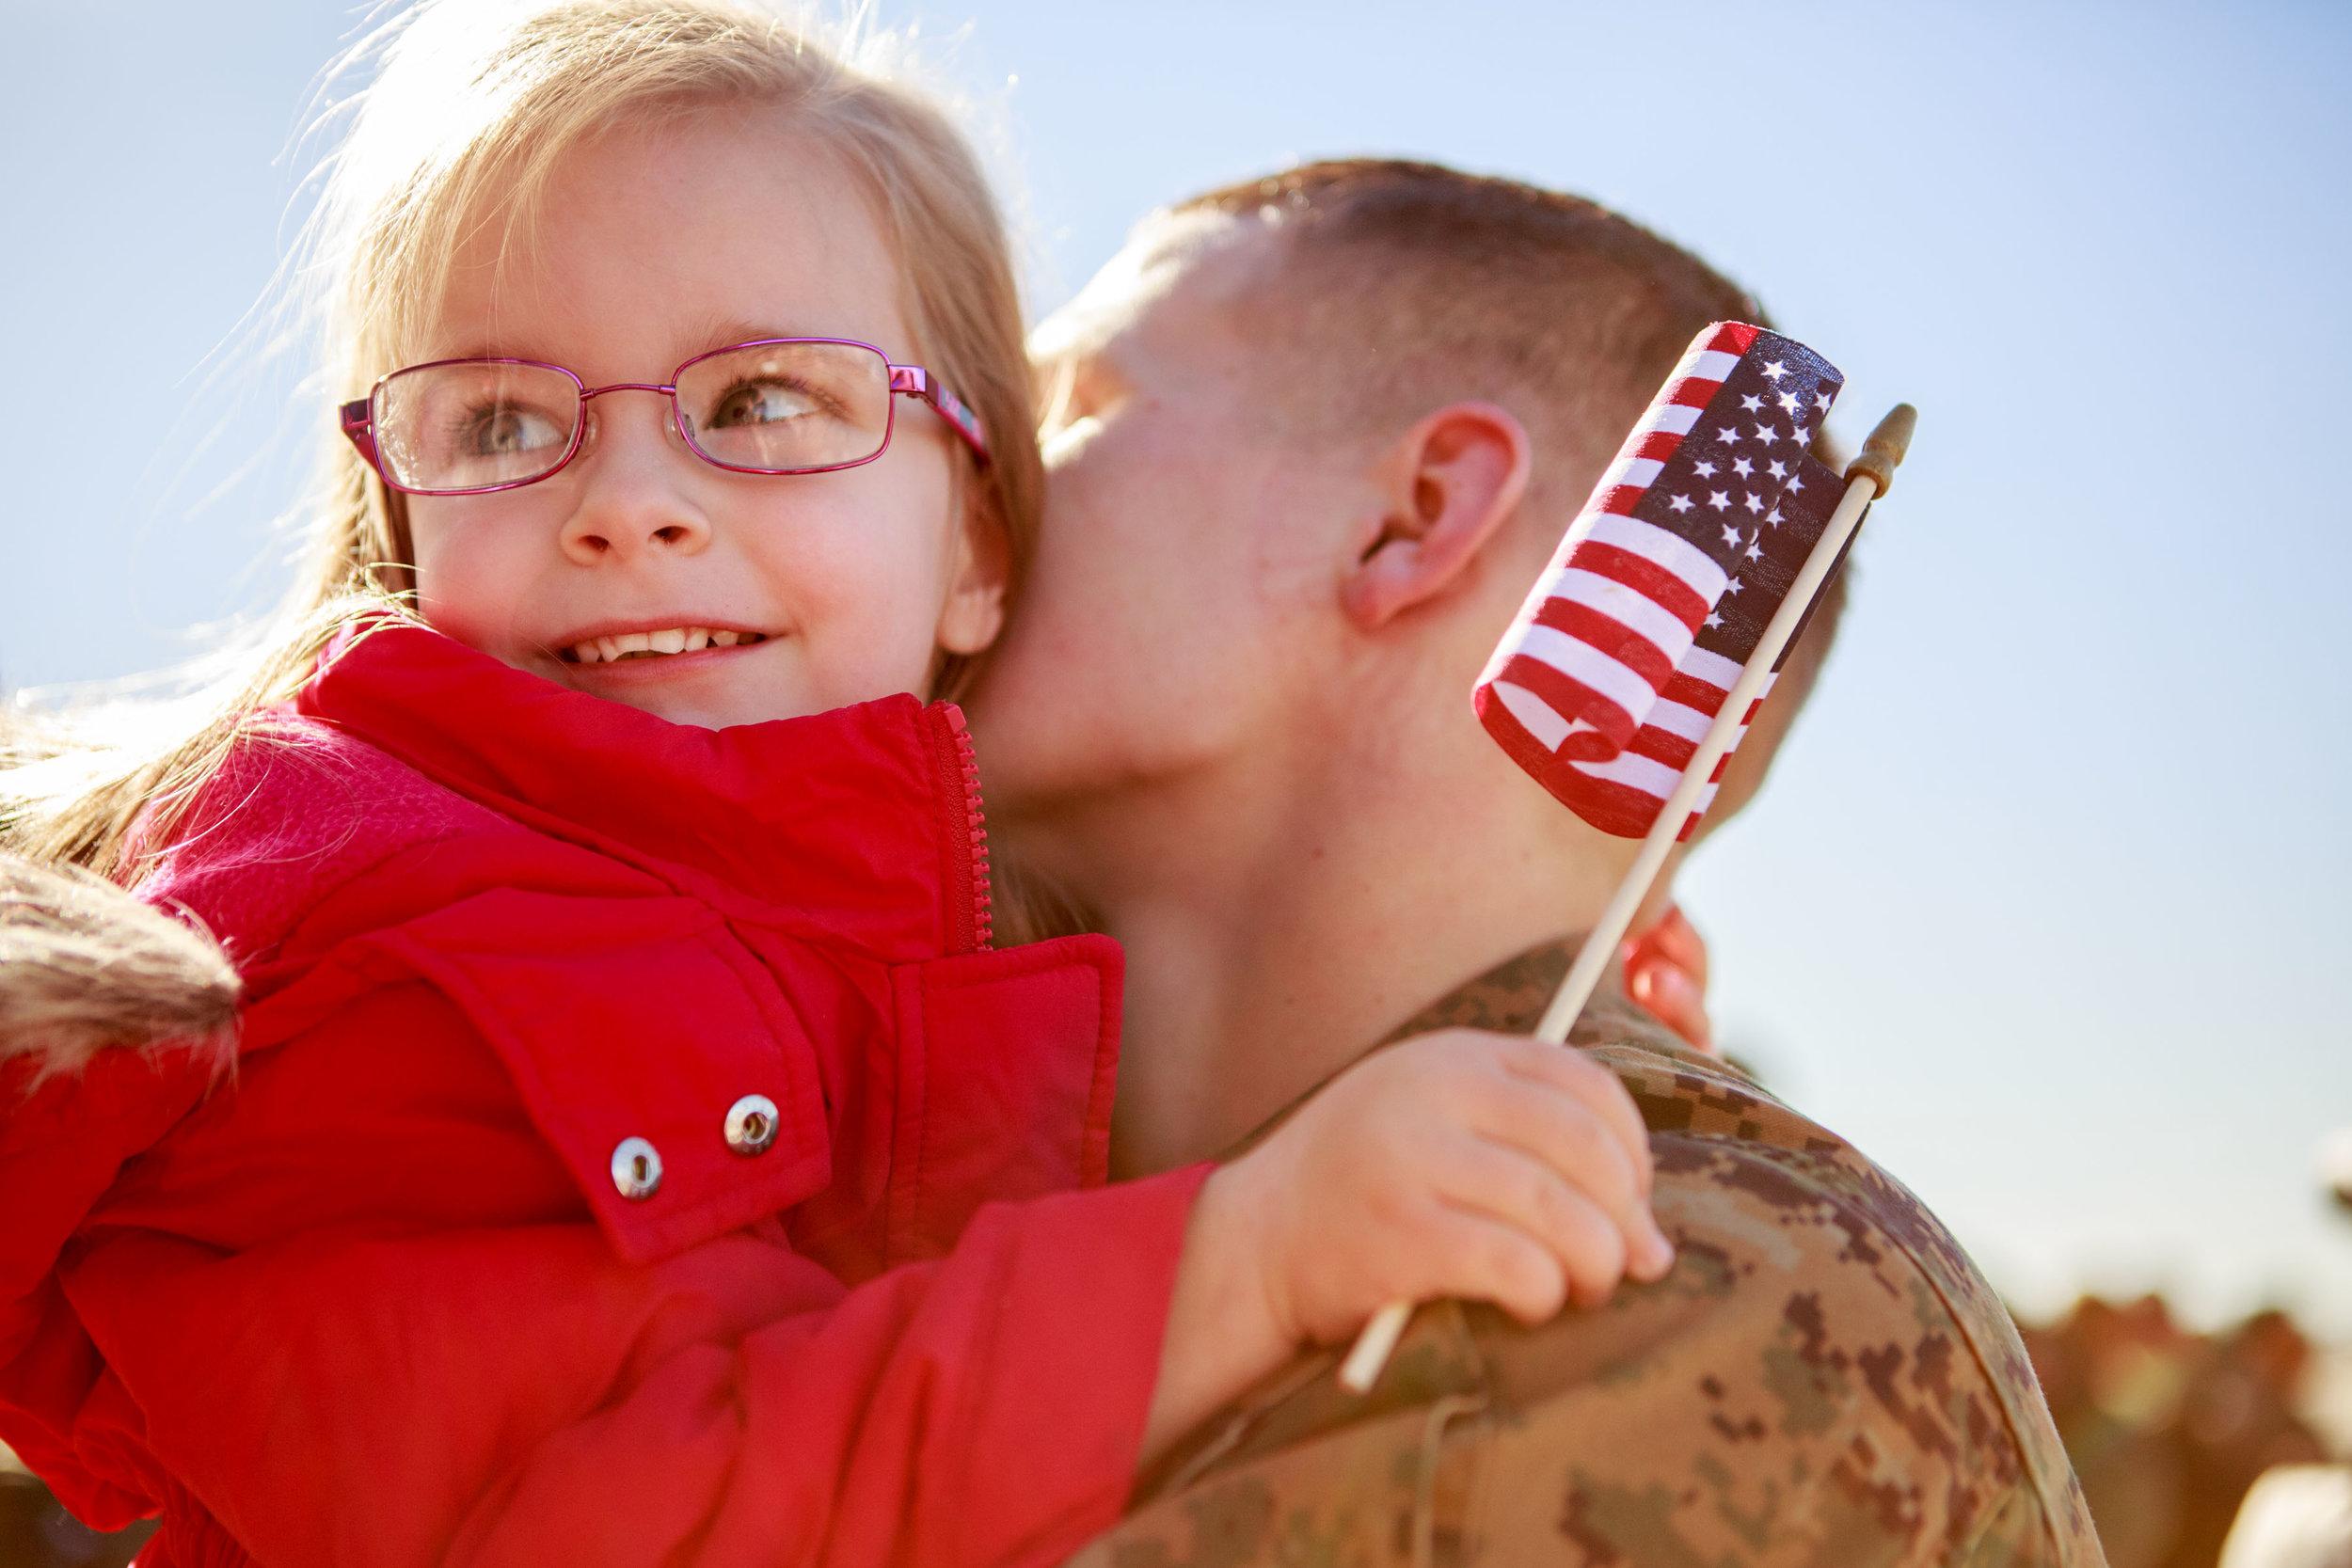 NC Military homecoming photographer Tiffany Abruzzo Photography